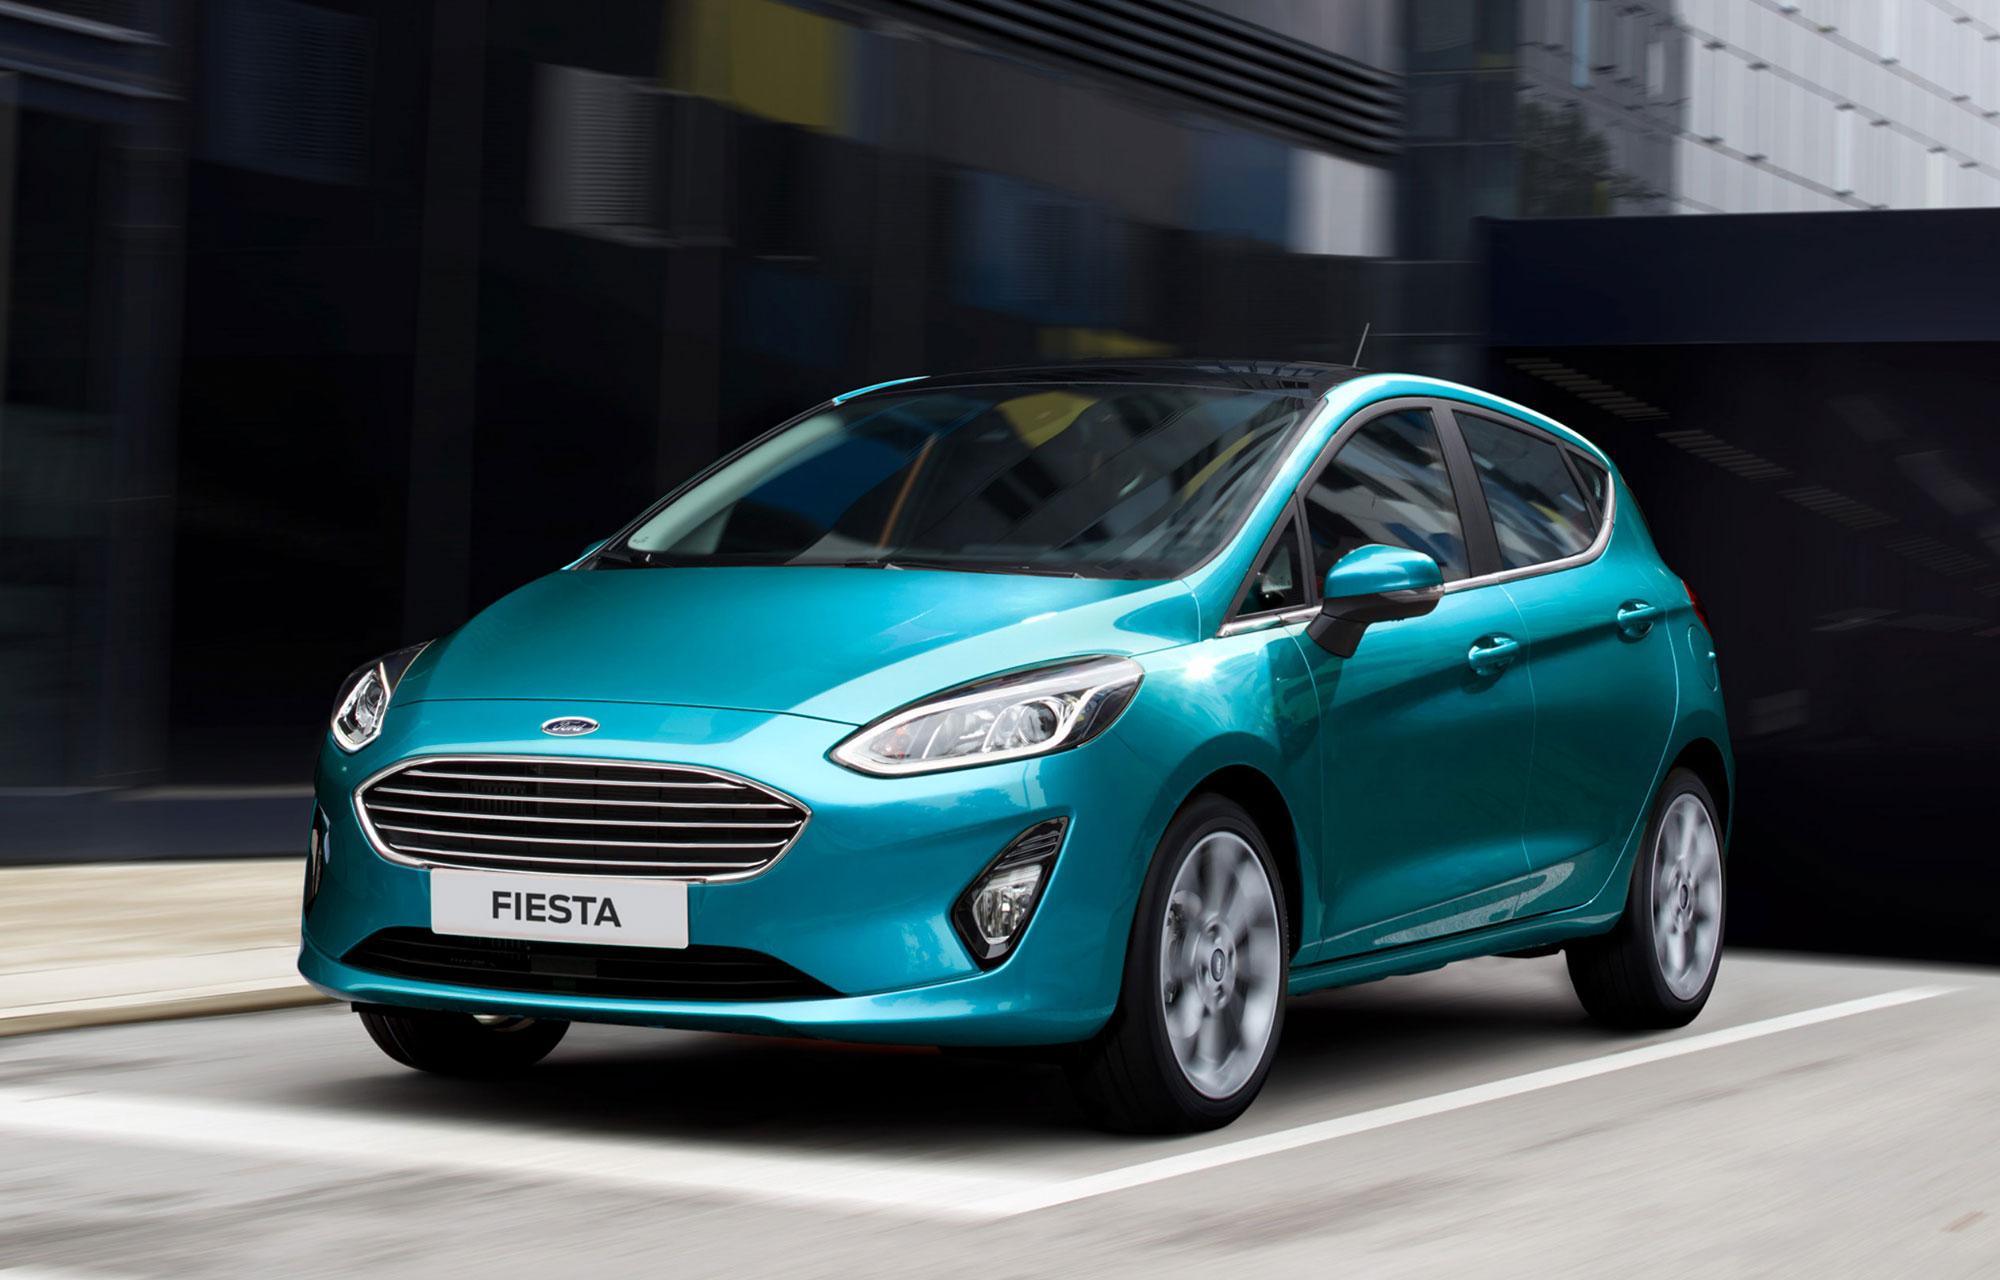 Ford Fiesta Titanium Nouvelle generation